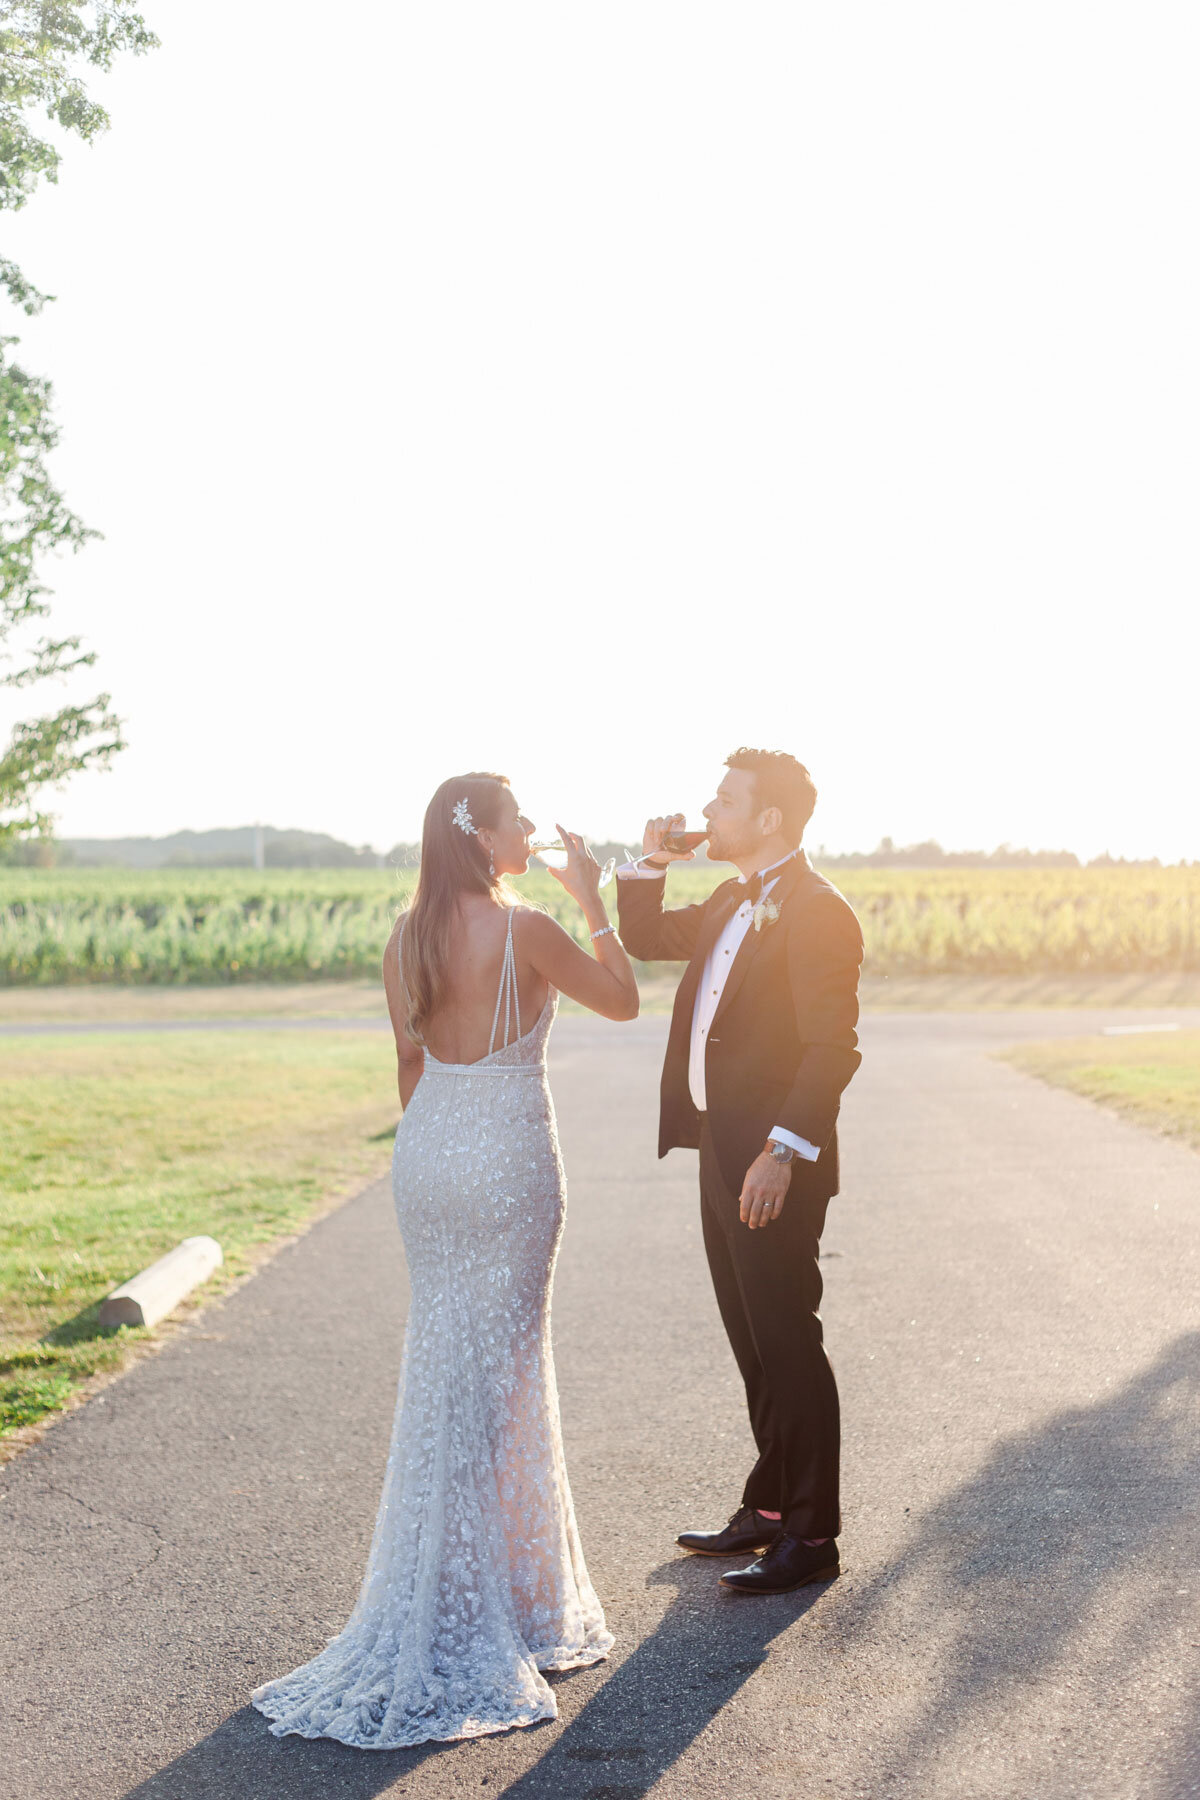 Chateau-des-Charmes-Wedding-Summer-Vineyard-Bride-Niagara-on-the-Lake-photos-by-Gemini-Photography-Ontario-0072.jpg